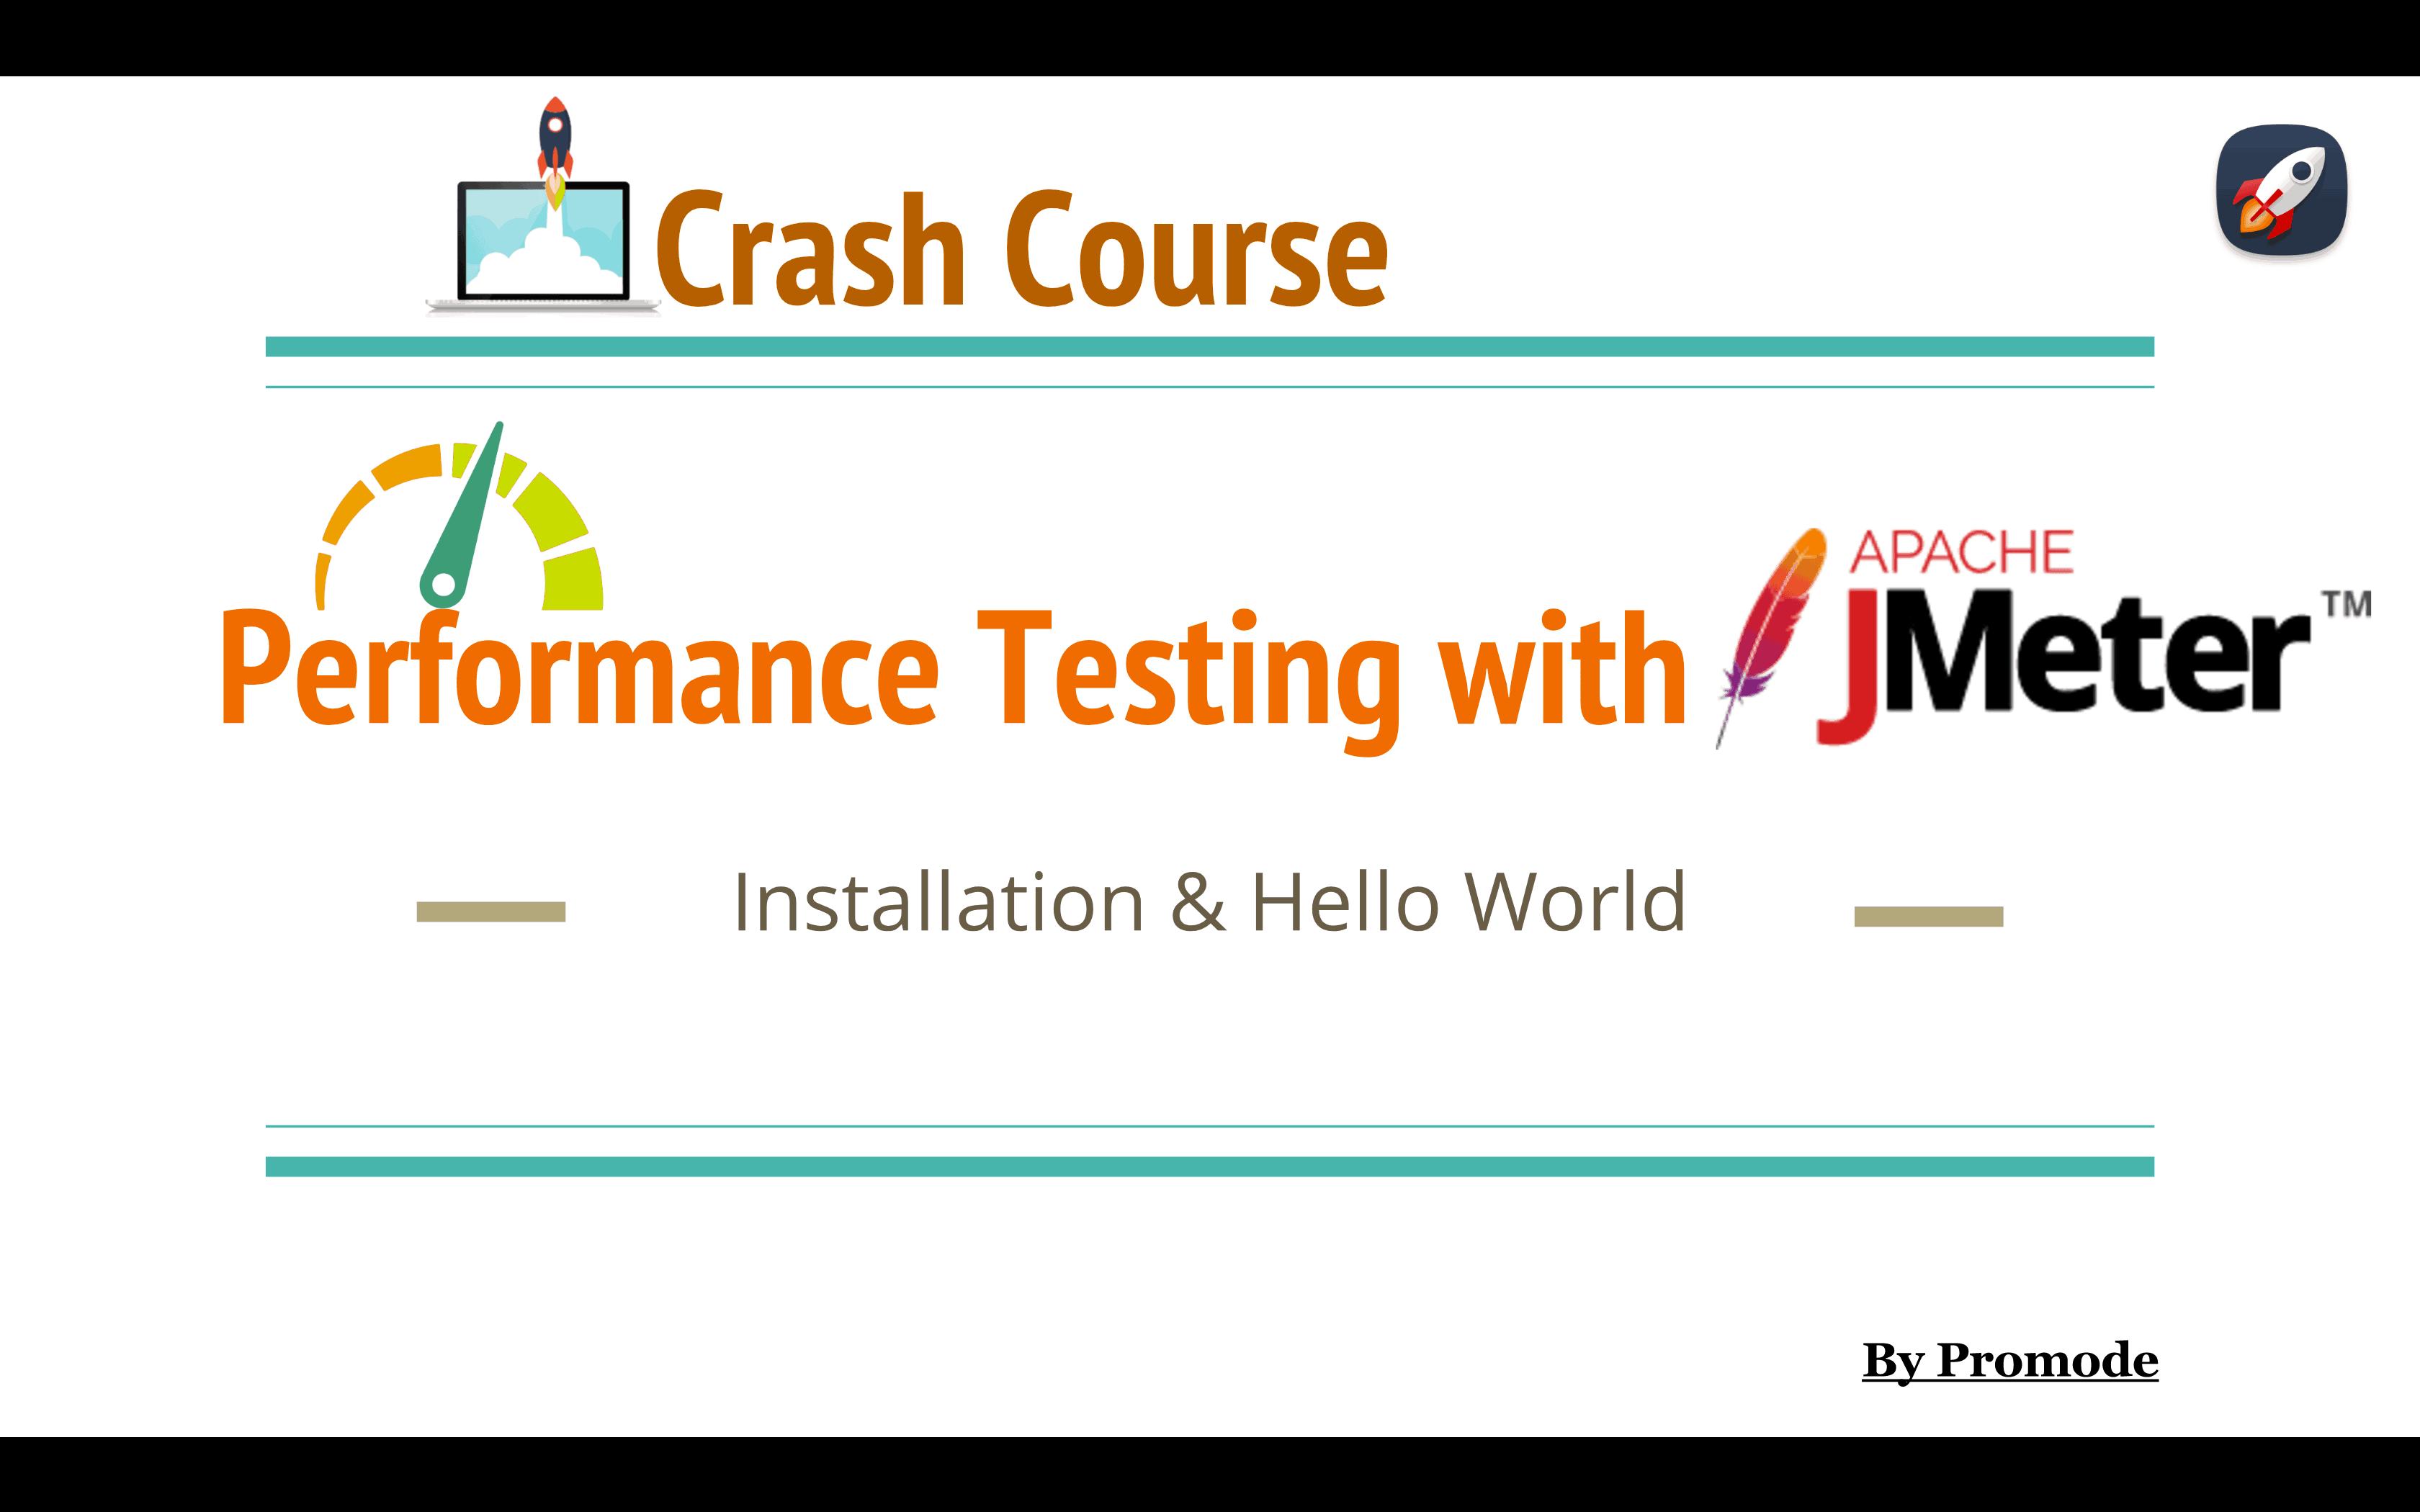 Performance Testing with Jmeter - Installation & Hello World